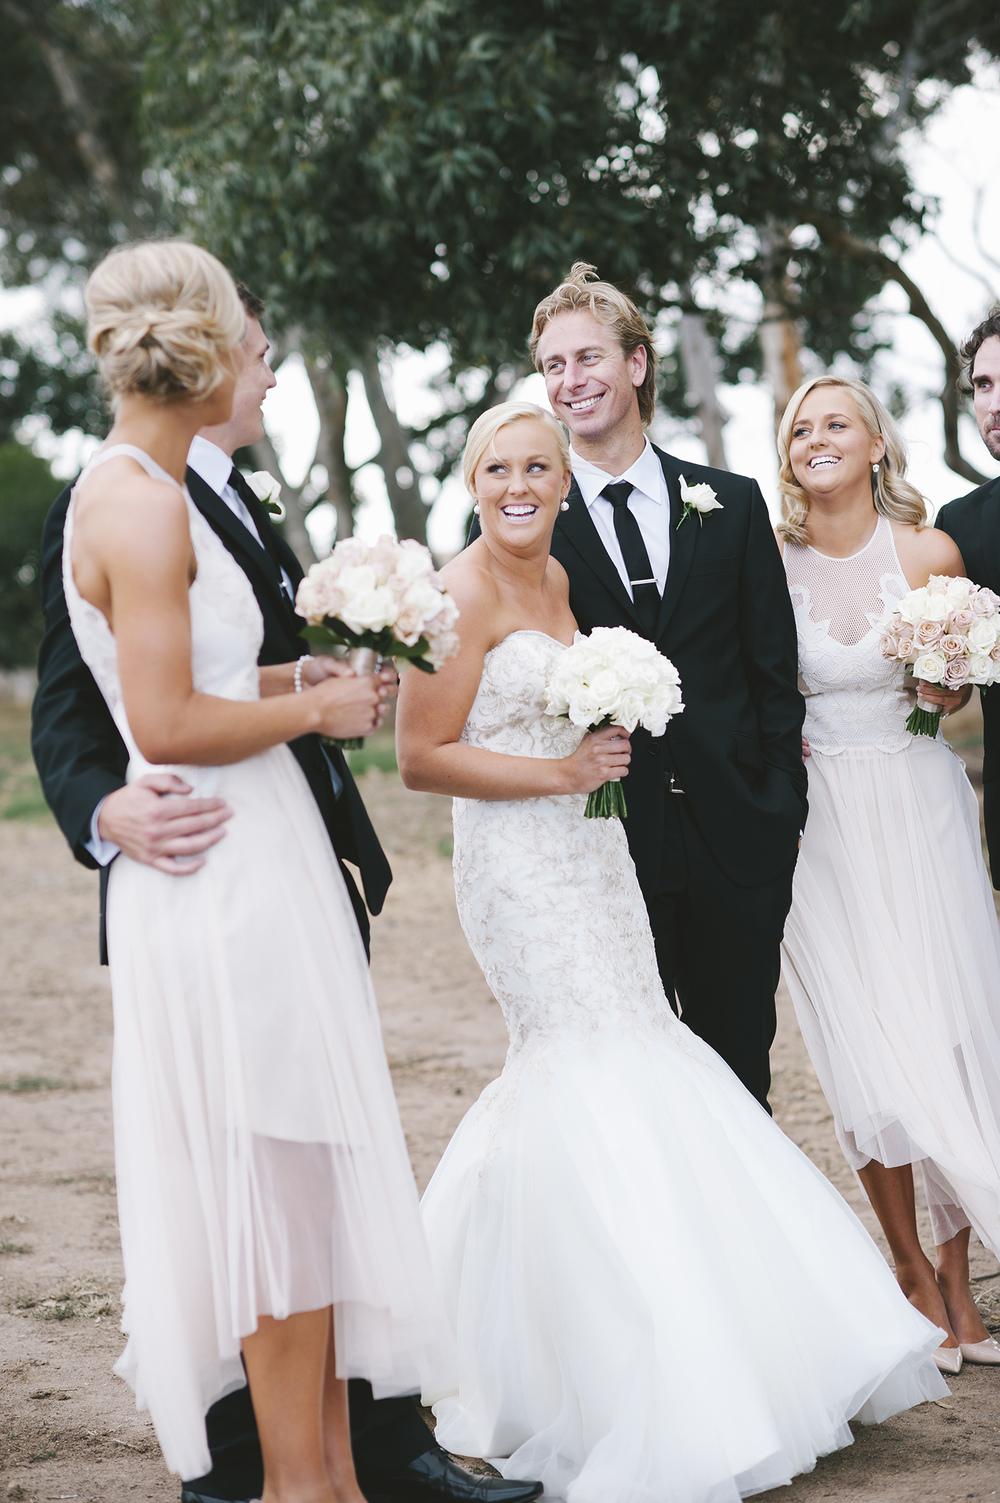 Casee + Mark     Real Wedding     Bellarine Peninsula